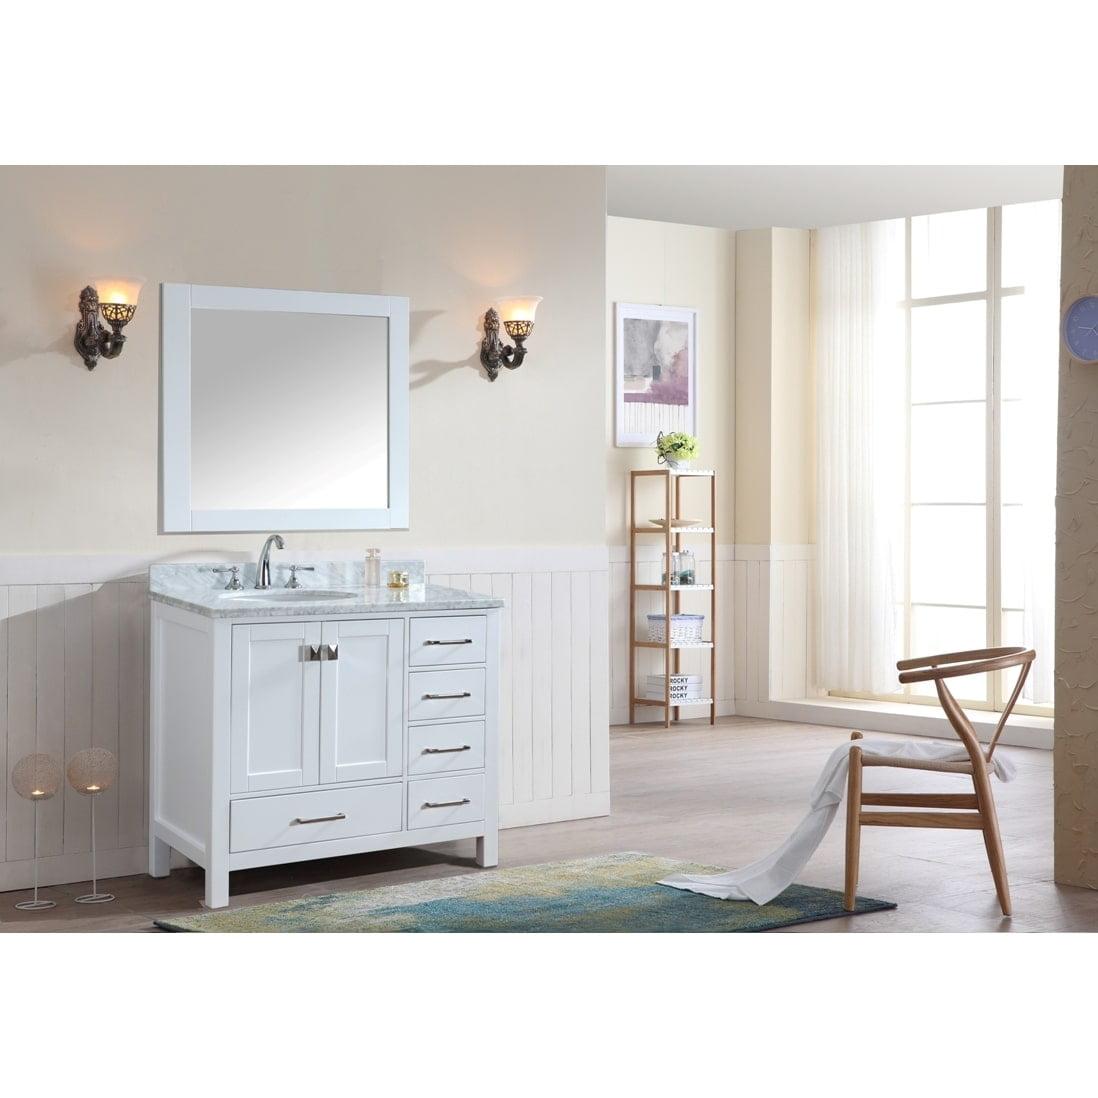 Ari Kitchen & Bath Bella 36 Inch White Single Bathroom Va...